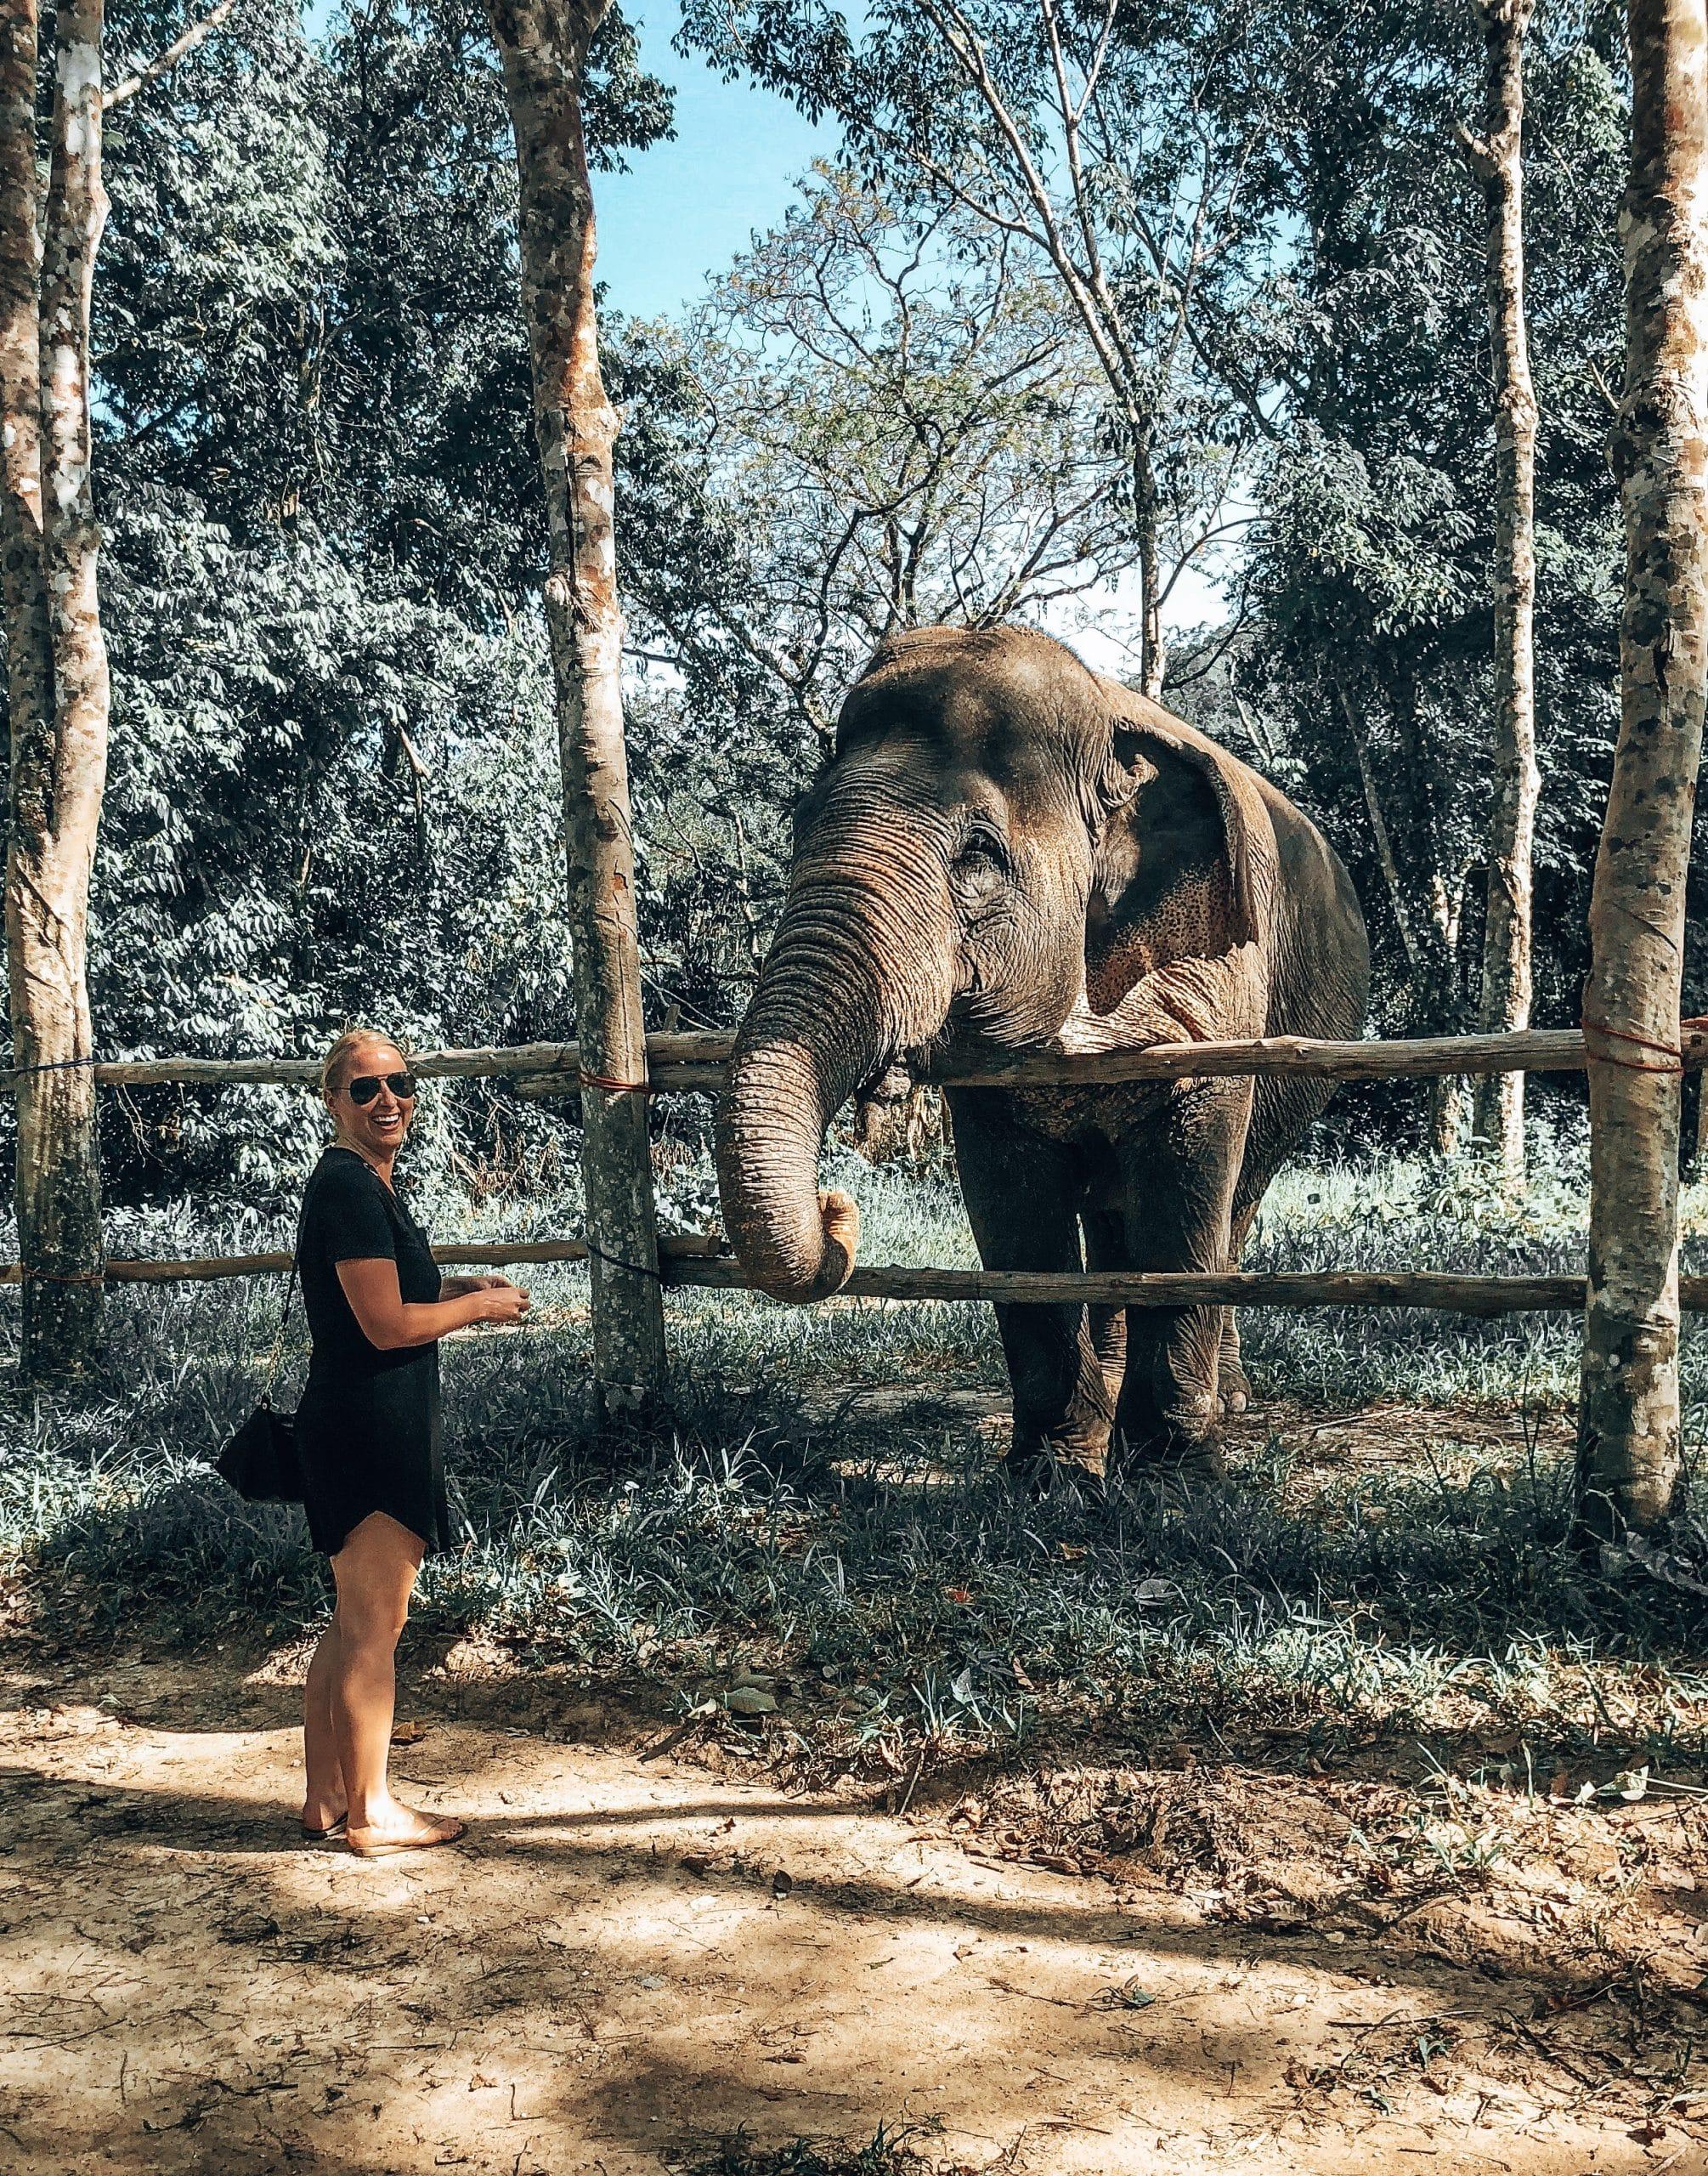 Woman feeding an elephant at the Phuket Elephant Sanctuary